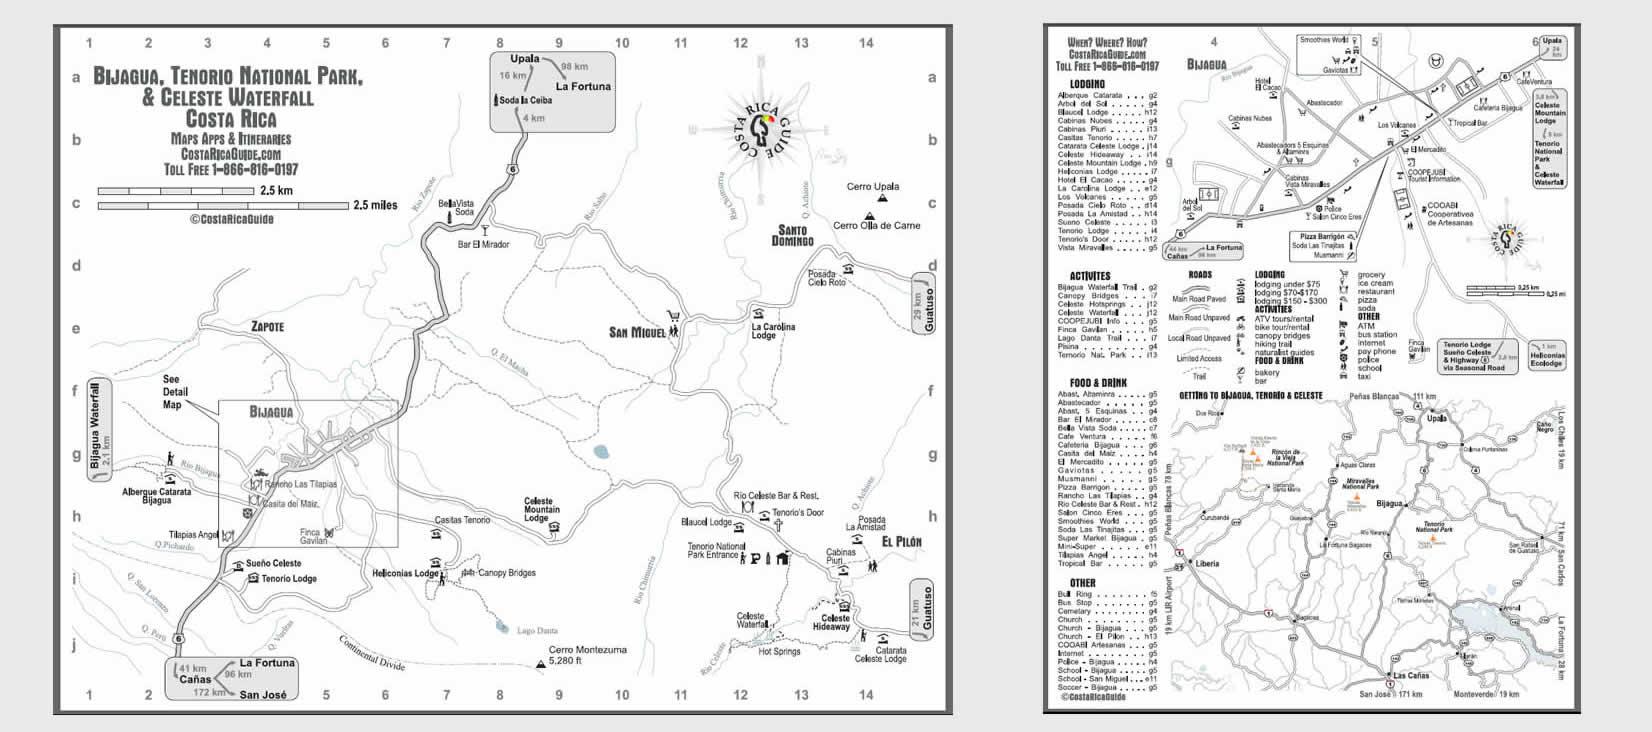 Tenorio, Celeste and Bijagua Map